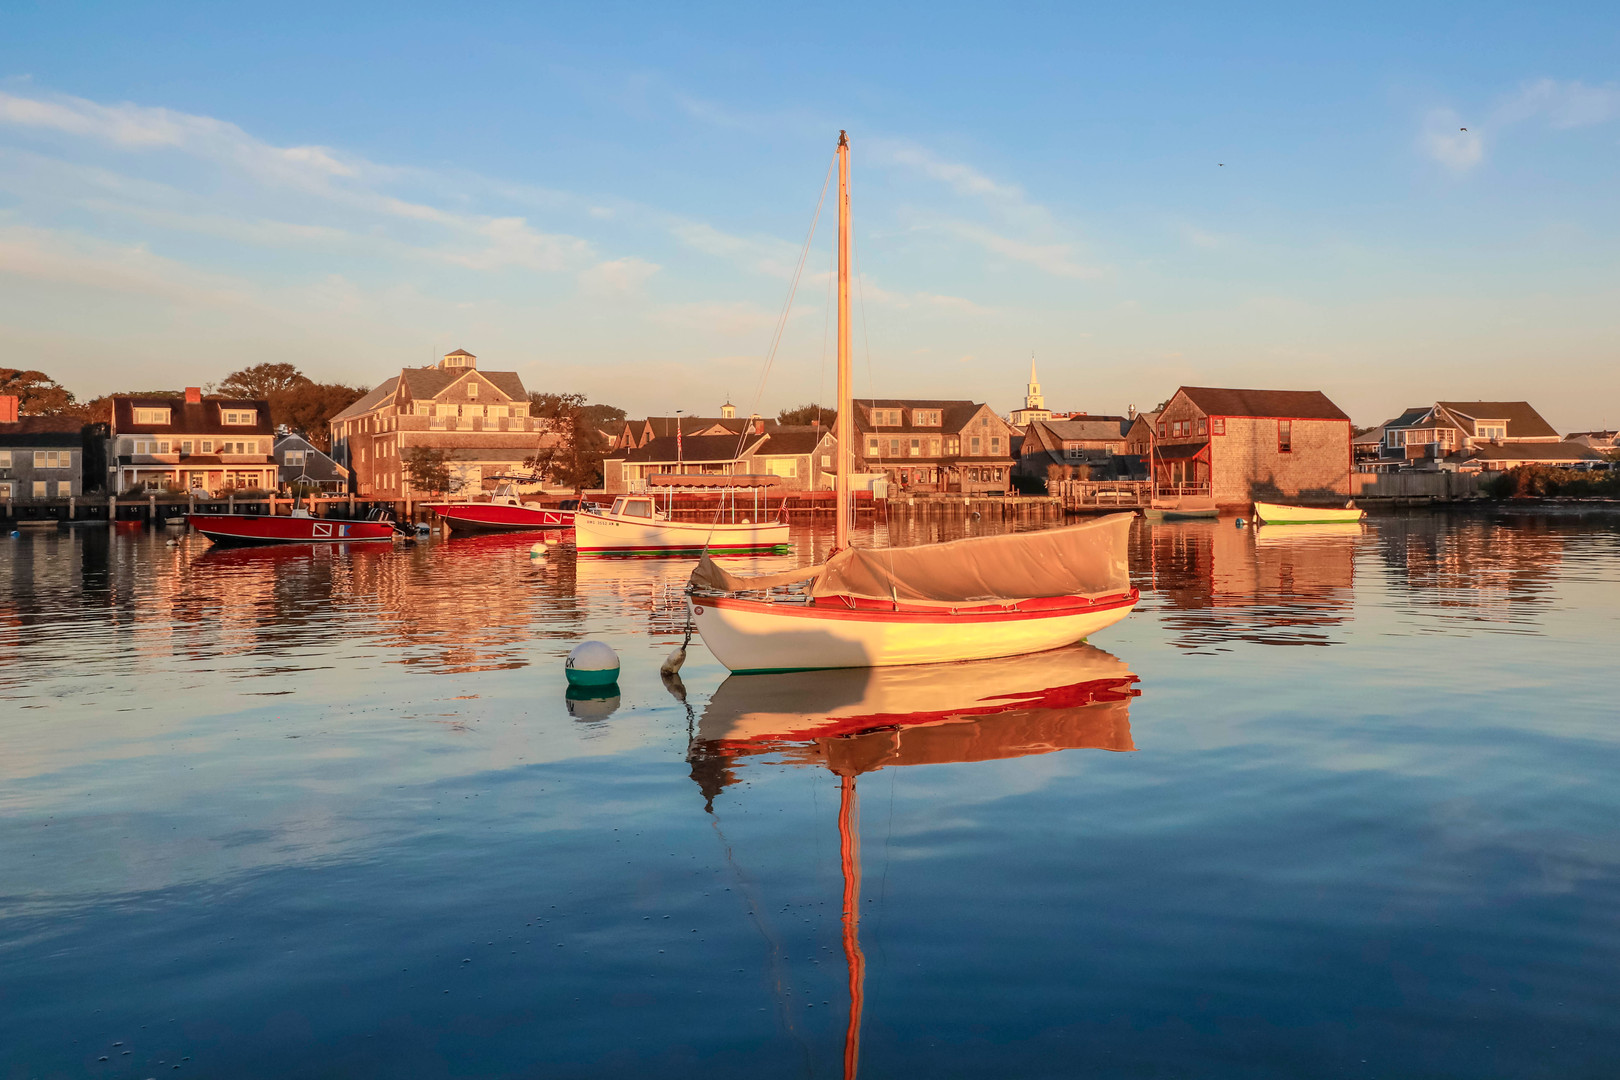 Nantucket Reflections